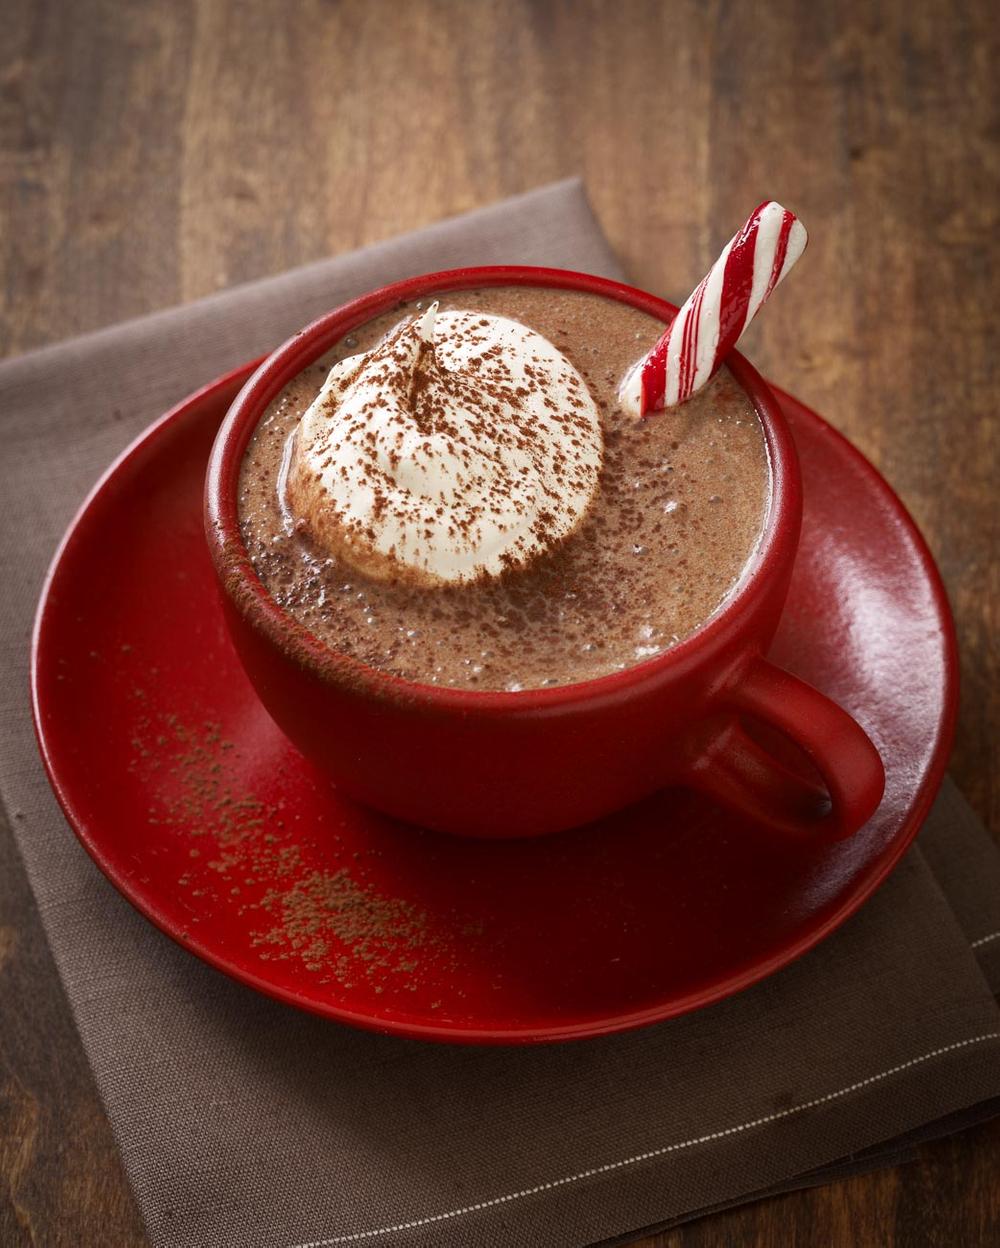 hot-chocolate-with-peppermint-food-stylist-san-francisco.jpg